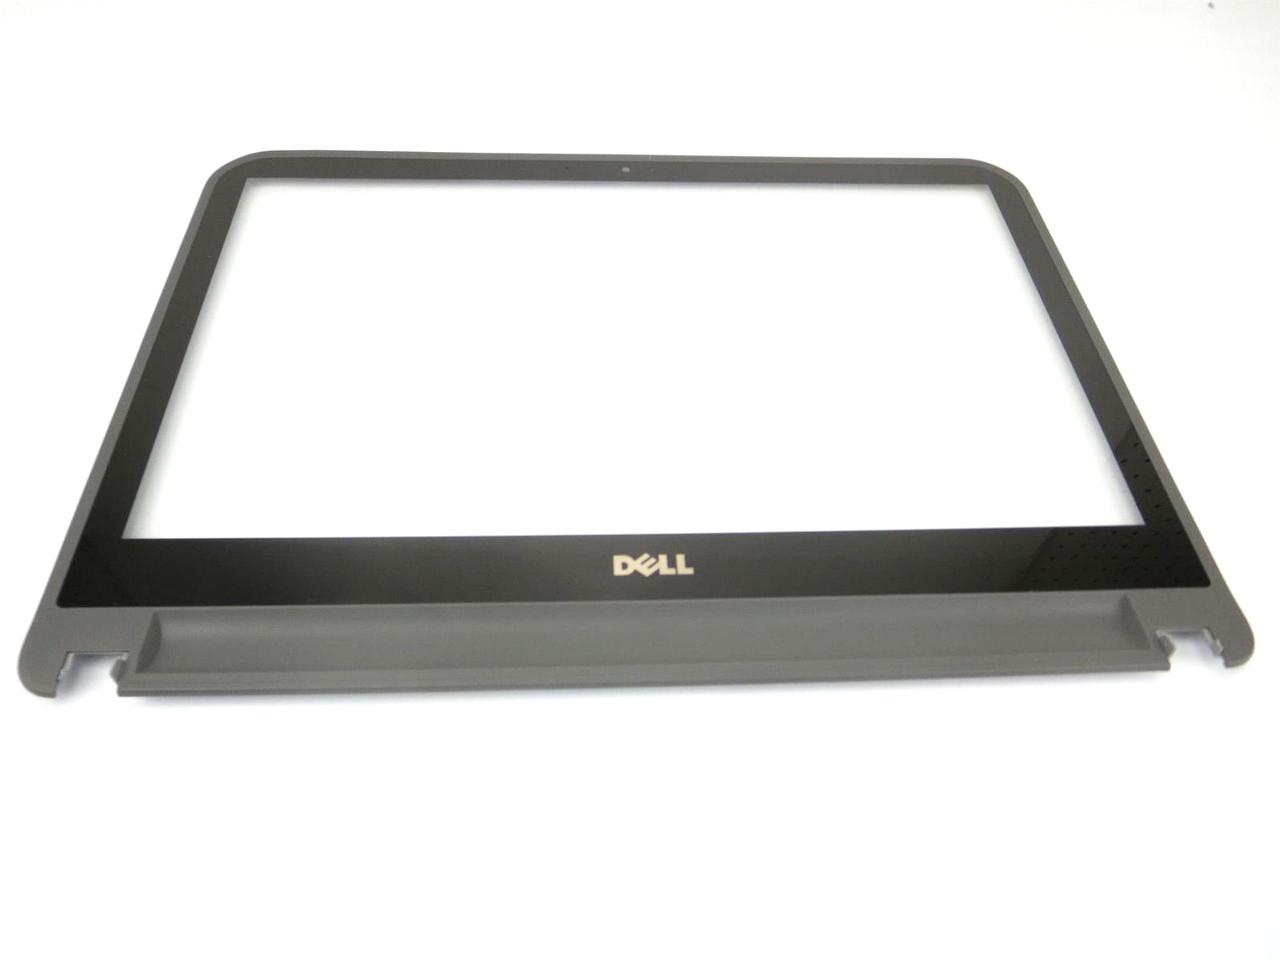 Dell Inspiron 14R-5421 14R-3421 Laptop Touchscreen Digitizer Glass Bezel - 8CYGW